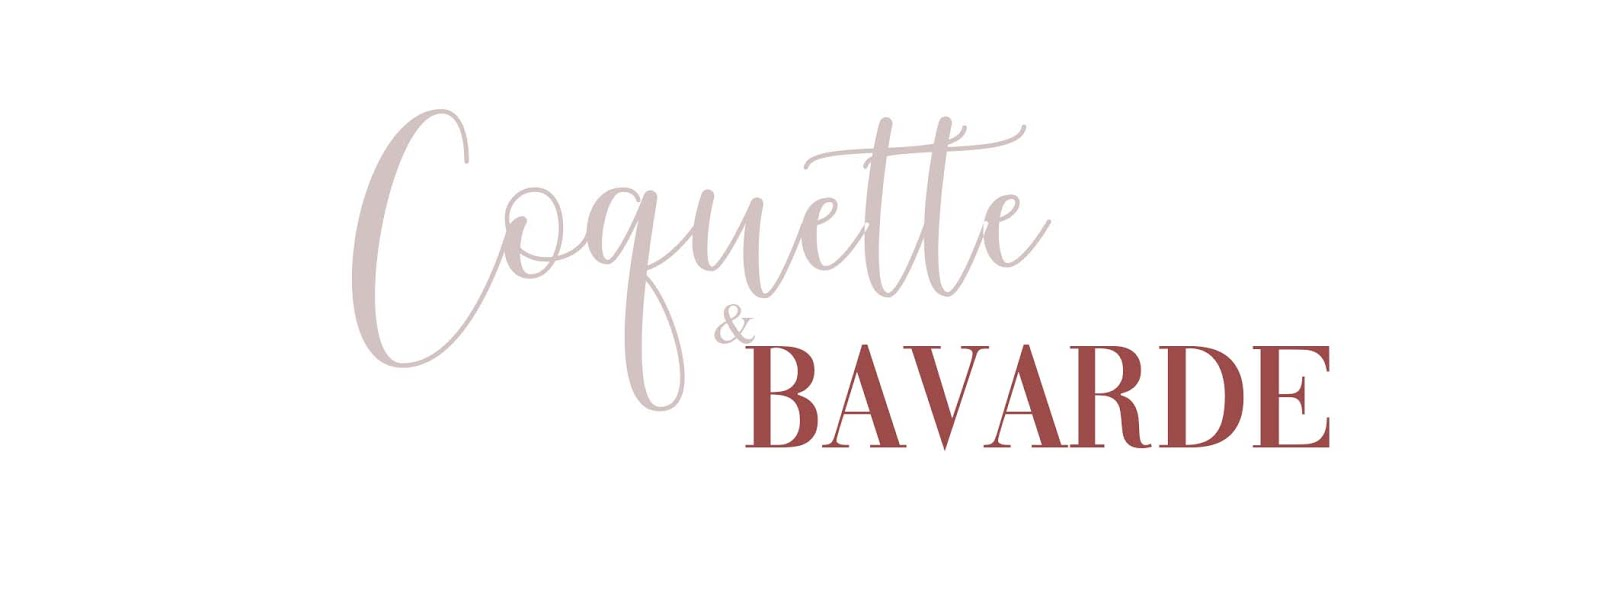 Coquette et Bavarde - Blog mode Caen